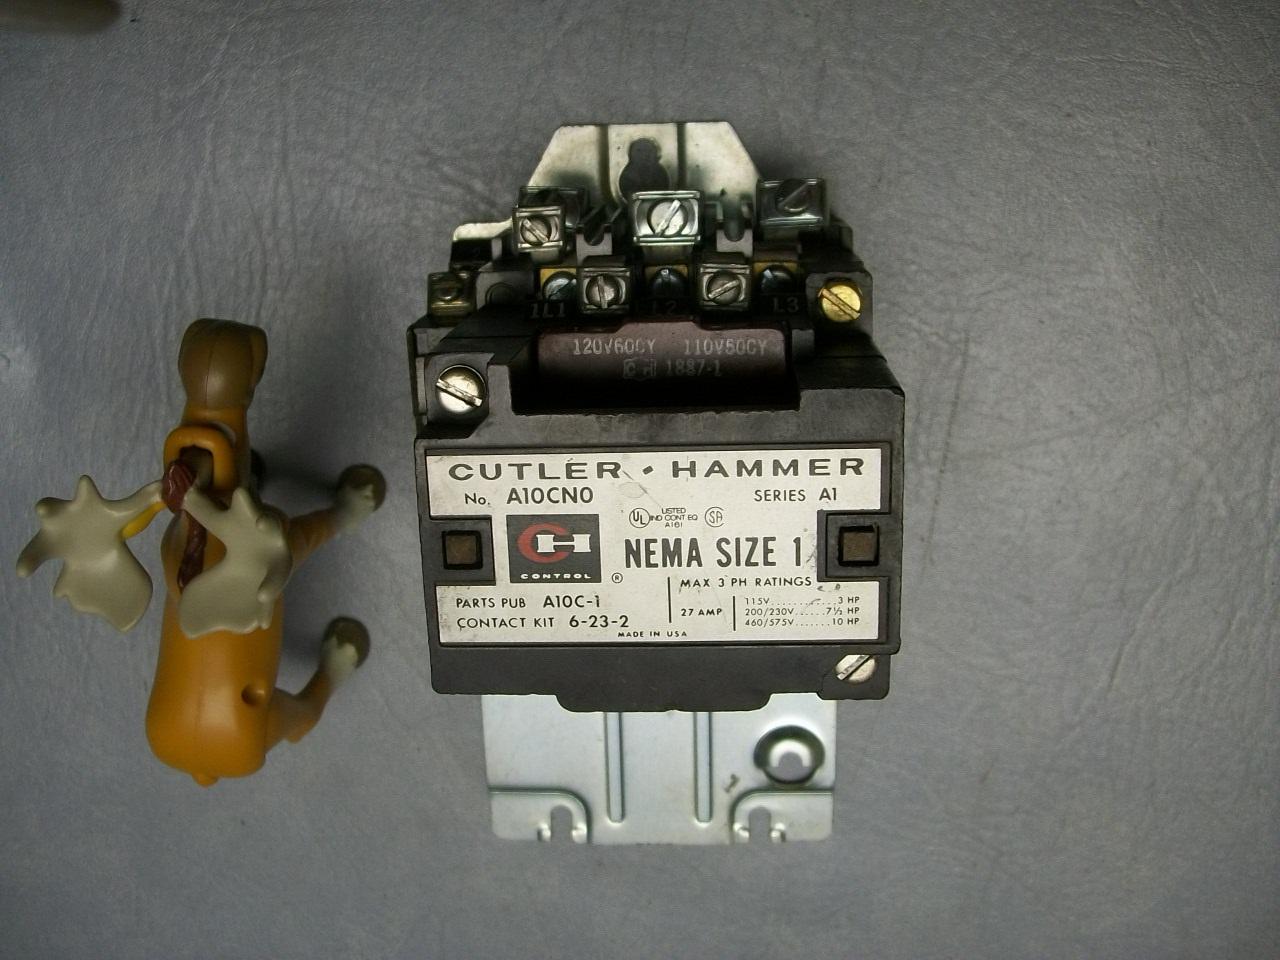 a10cn0_a10cno_cutler_hammer_size_1_starter_120v_-_no_overload__2_ Cutler Hammer A Cno Wiring Diagram on cutler supply catalog, cutler hammer fuses, cutler hammer transmission, cutler hammer torque specifications, cutler hammer parts list, cutler hammer schematics, cutler hammer lights, cutler hammer electrical, cutler hammer starter, cutler hammer controls, cutler hammer drawings,